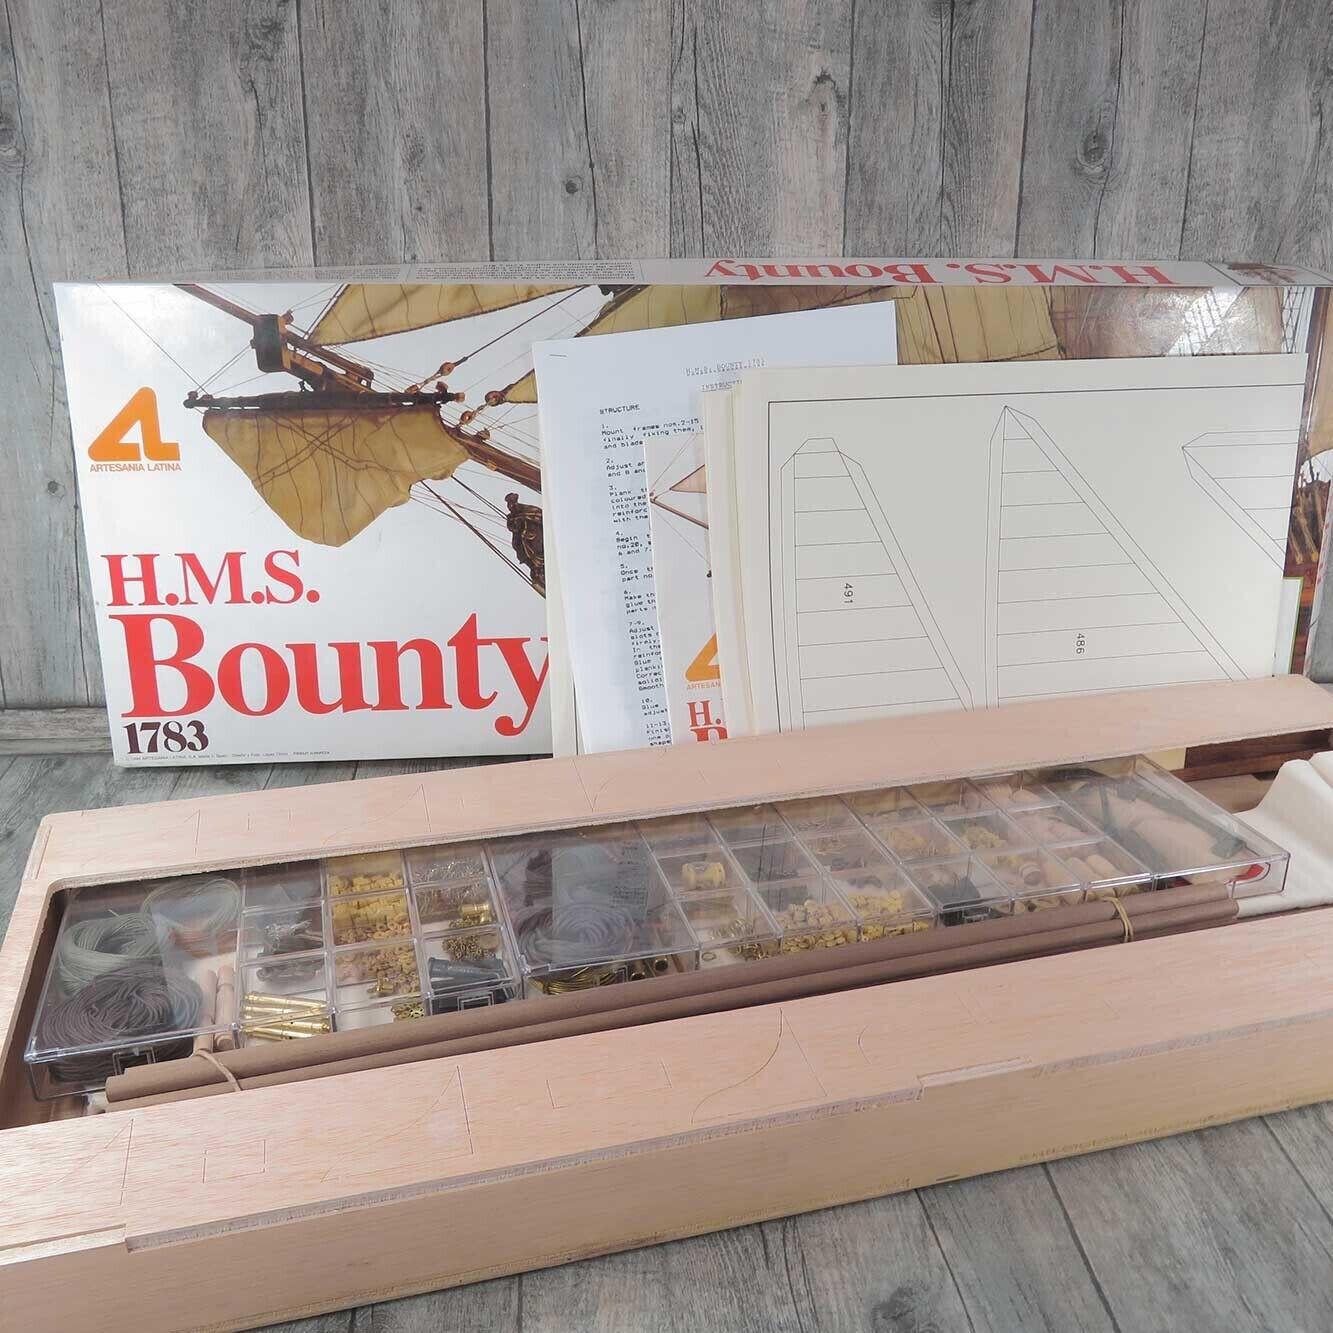 ARTESANA LATINA 20730 - 1 48 - H.M.S. Bounty 1783 - OVP- A26793